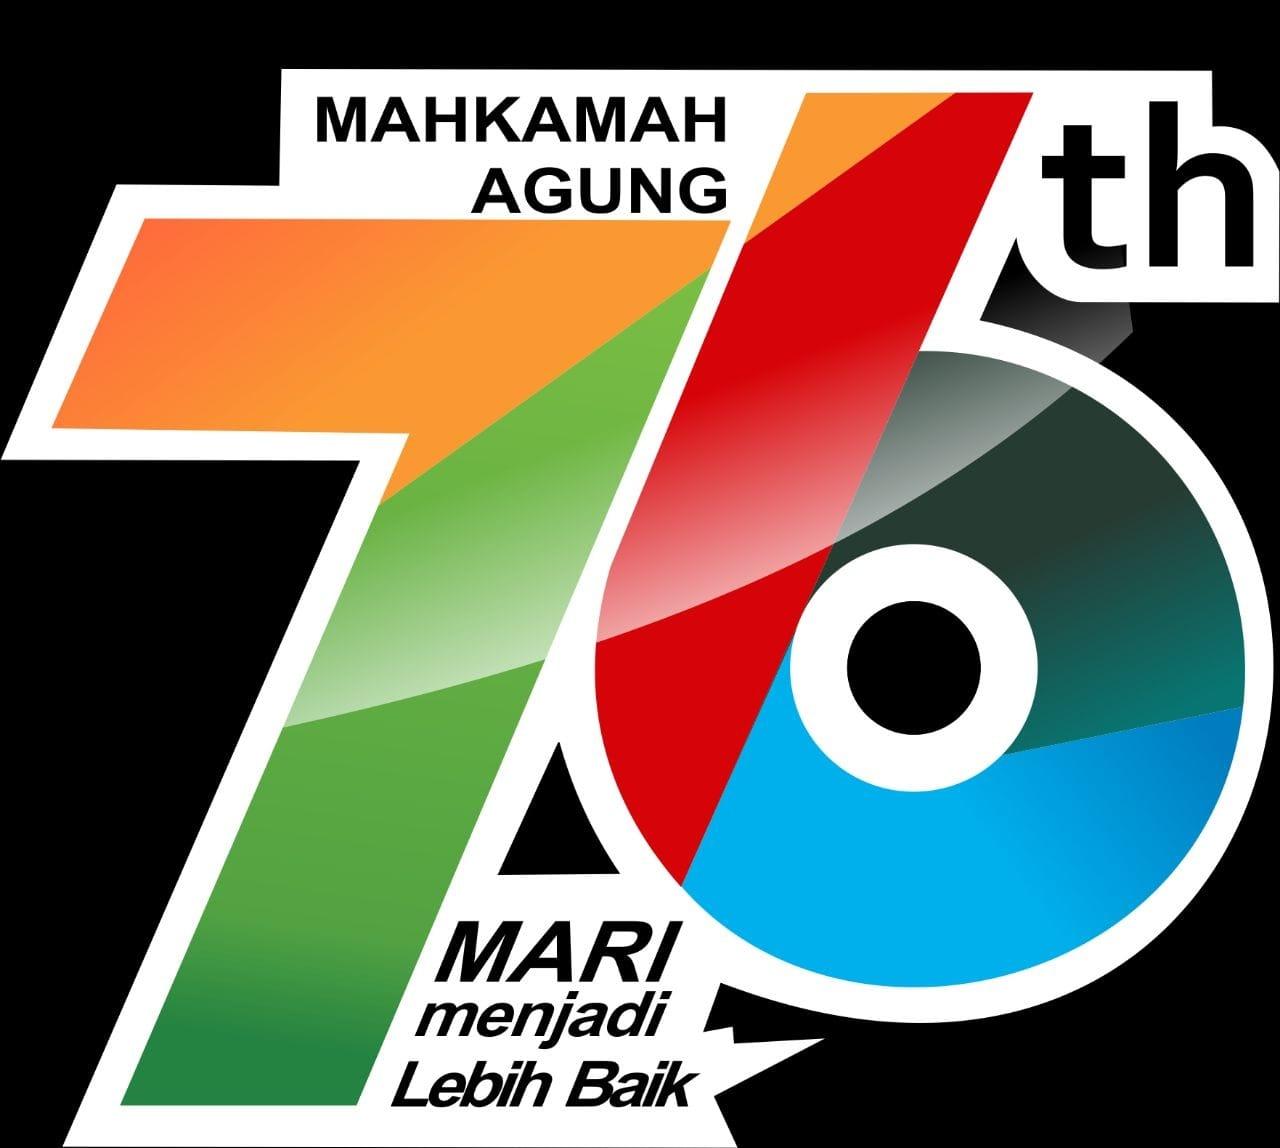 SELAMAT HARI ULANG TAHUN MAHKAMAH AGUNG REPUBLIK INDONESIA KE 76